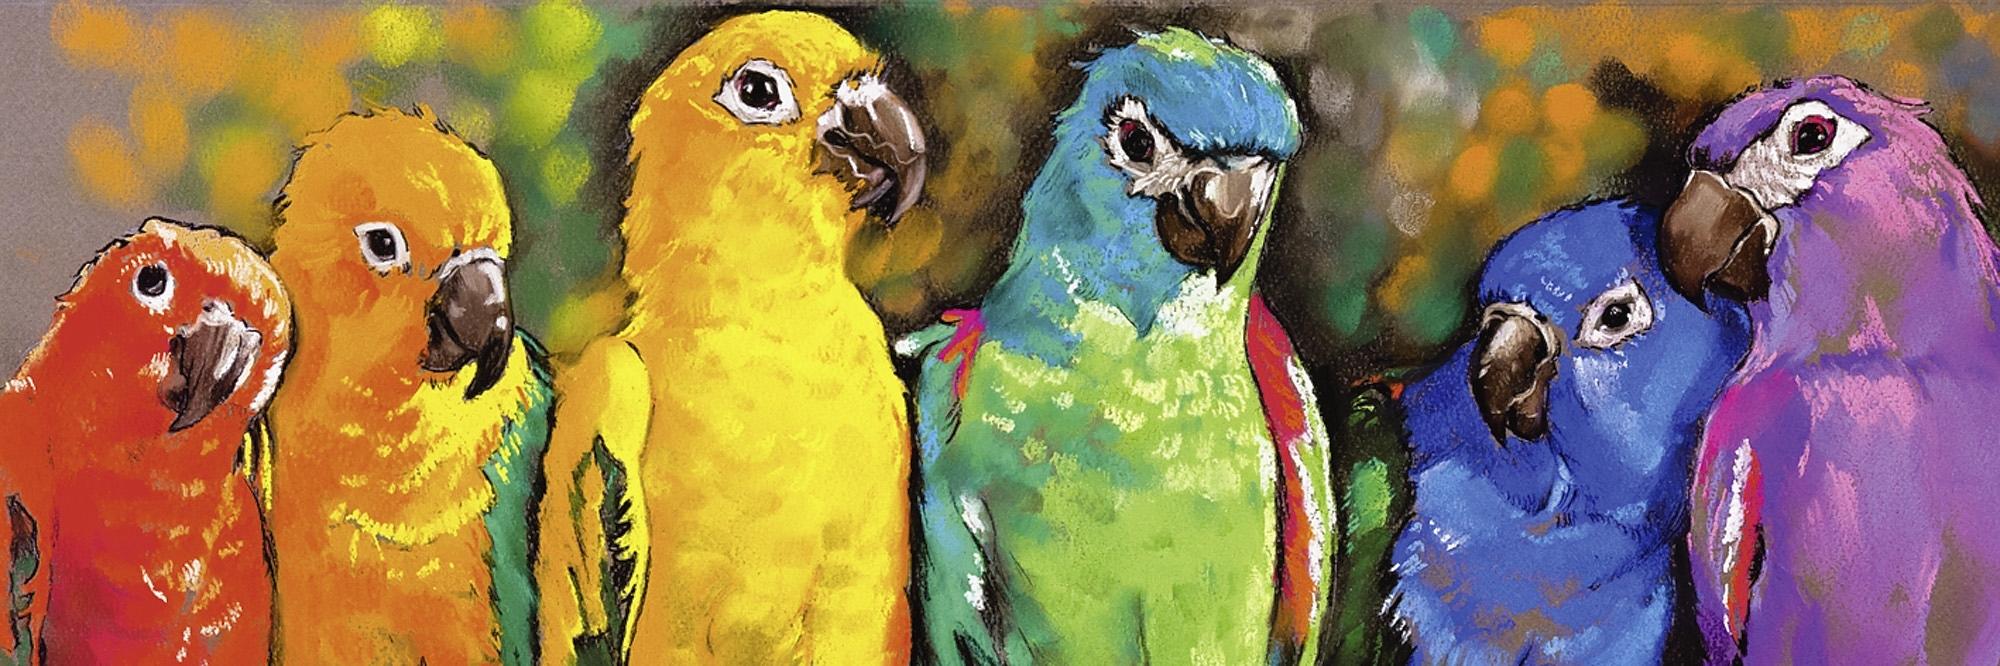 Home affaire artprint op linnen Automatic9751: papegaaien 120/40 cm bij OTTO online kopen